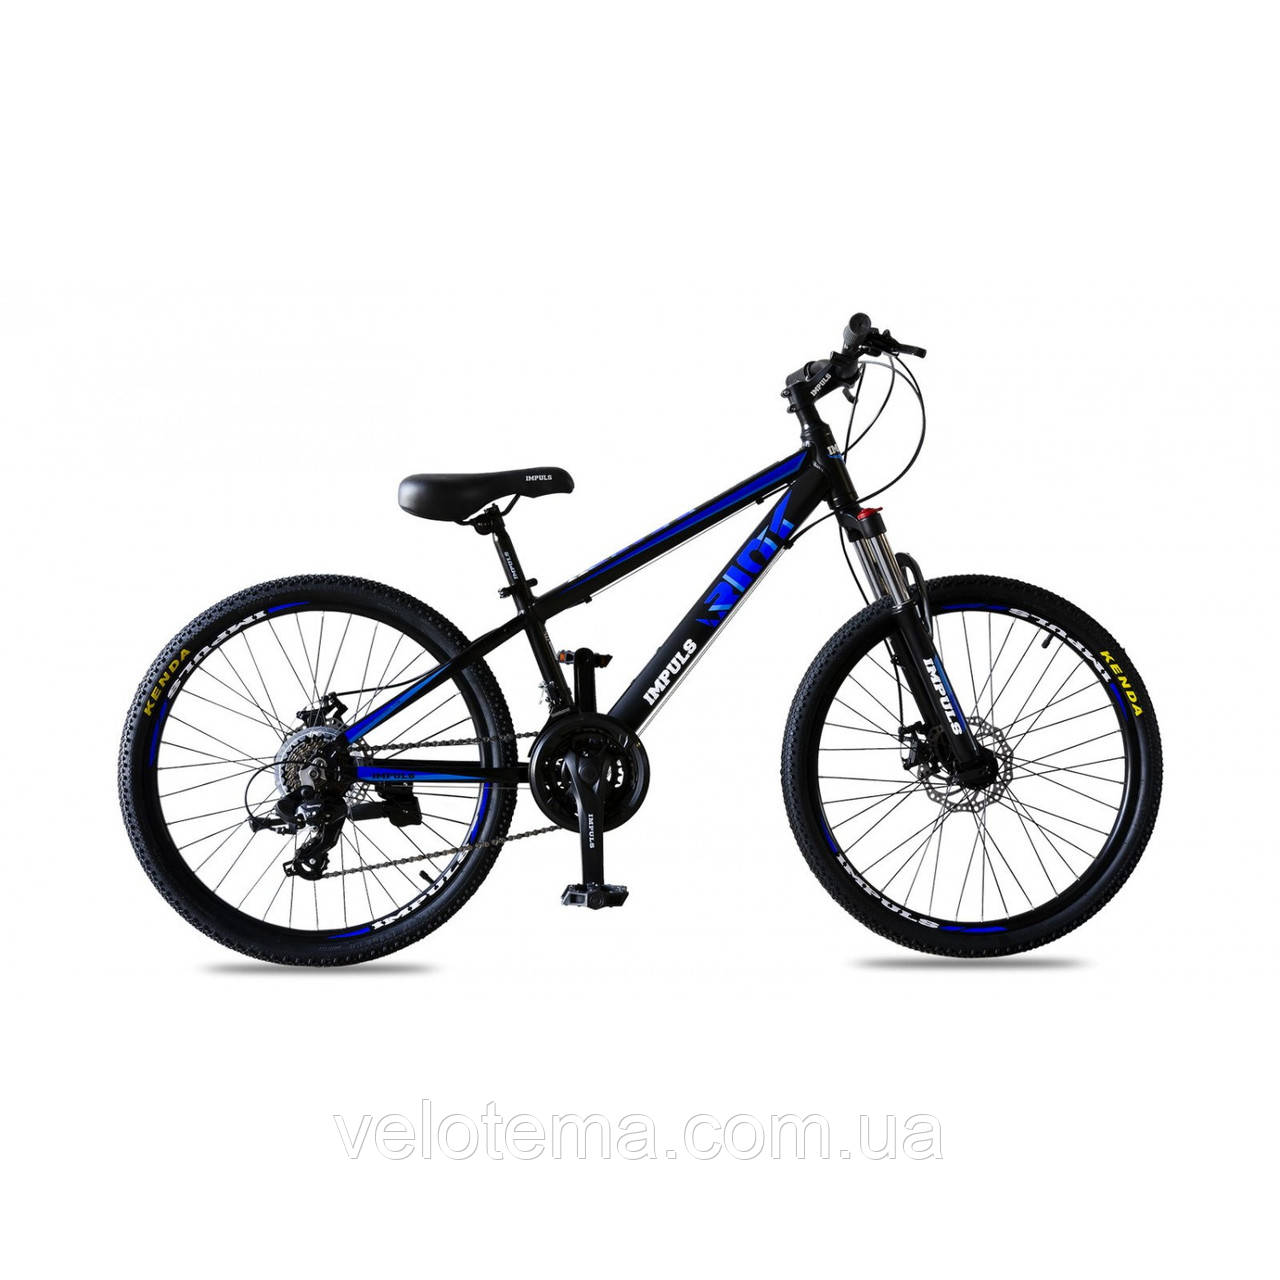 "Велосипед IMPULS RIO 24"" черно-синий Рама 12"" 2020г"